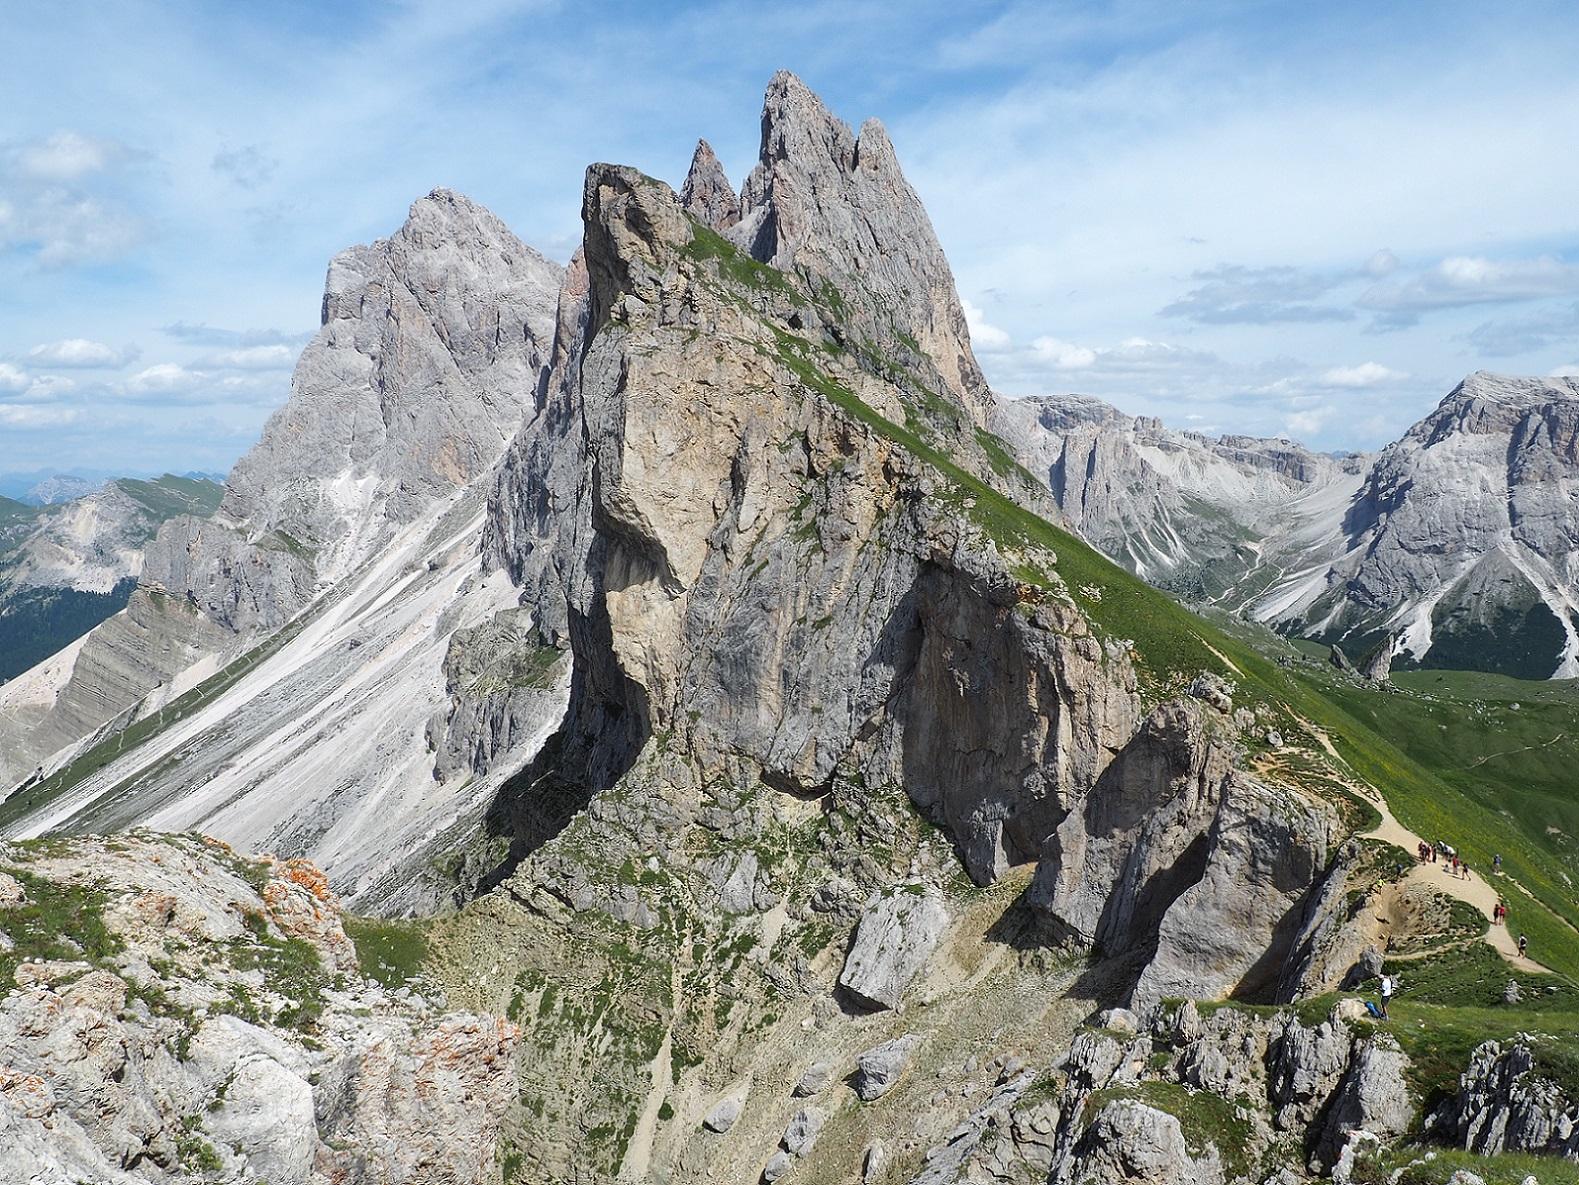 Seceda dans les Dolomites en Italie, Tyrol du Sud